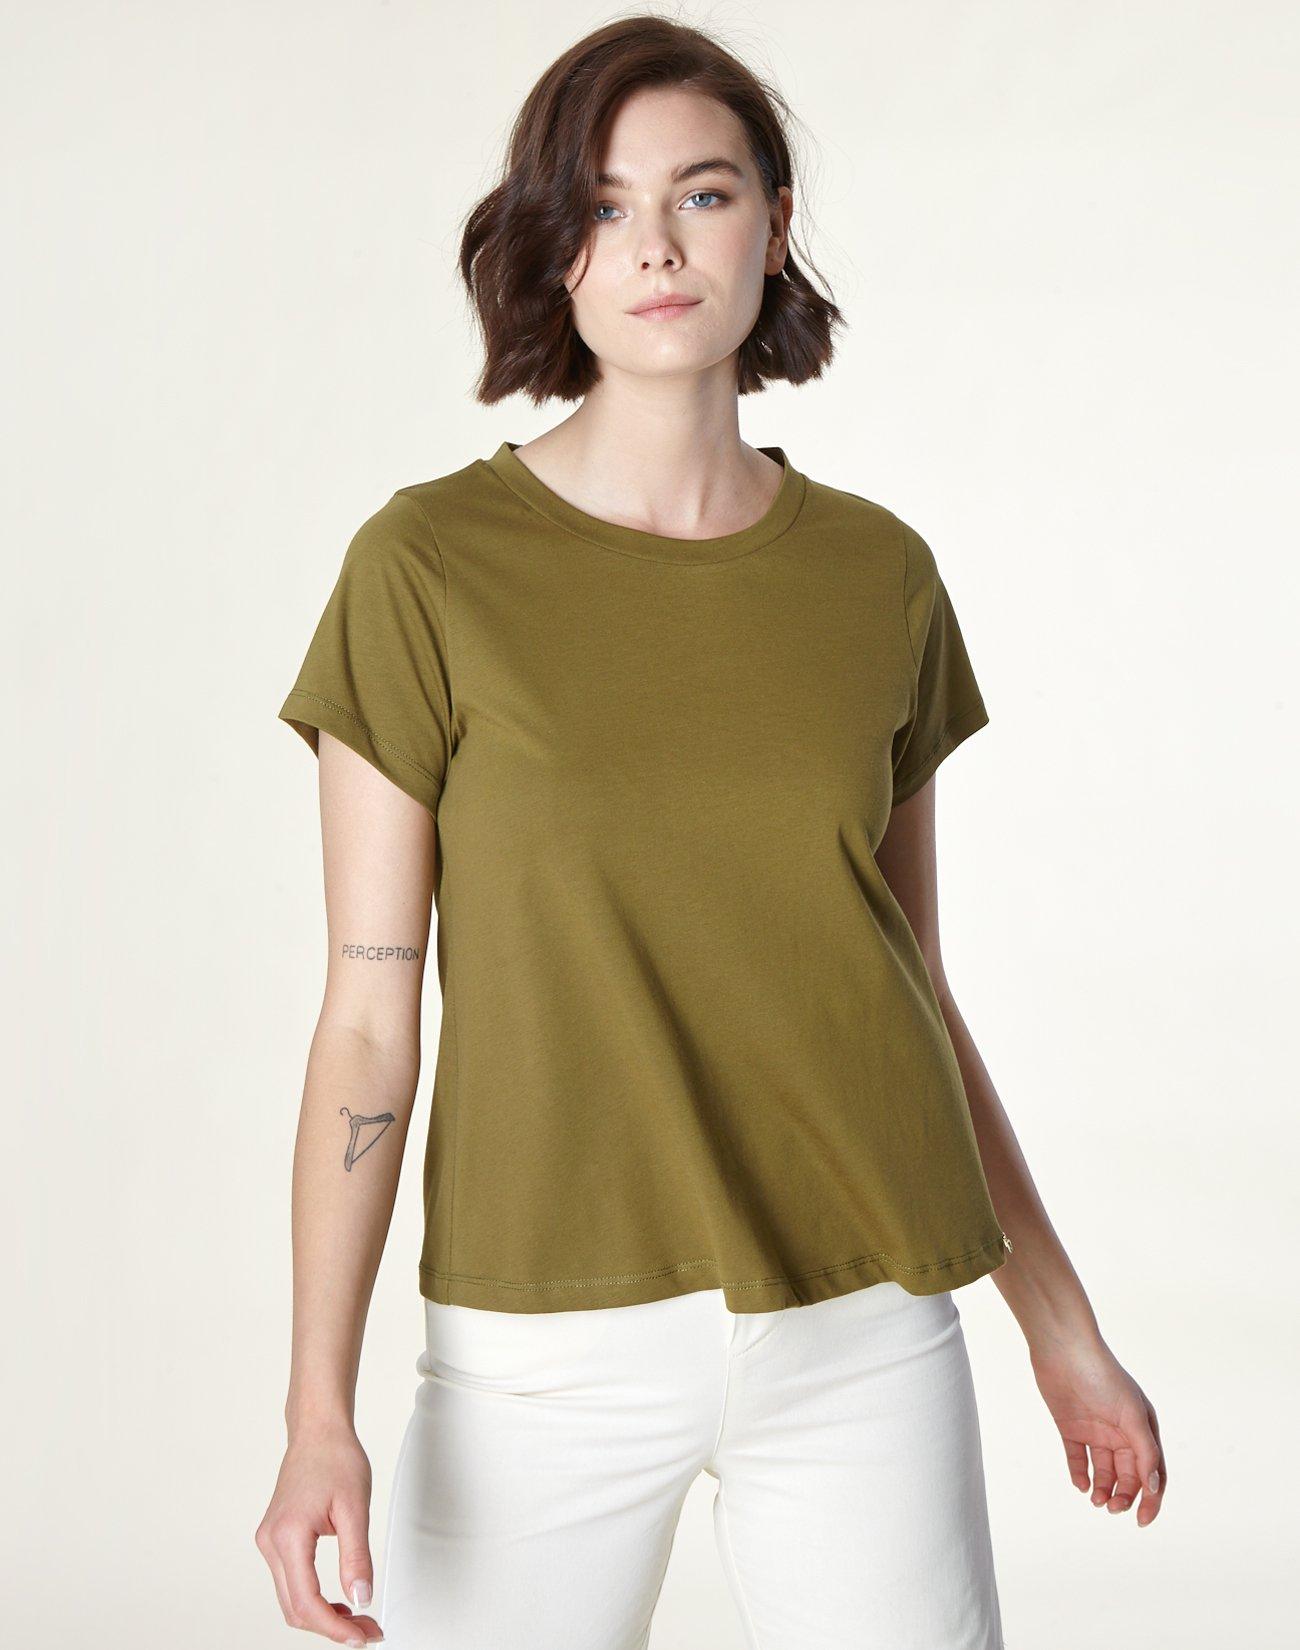 Organic cotton T-shirt